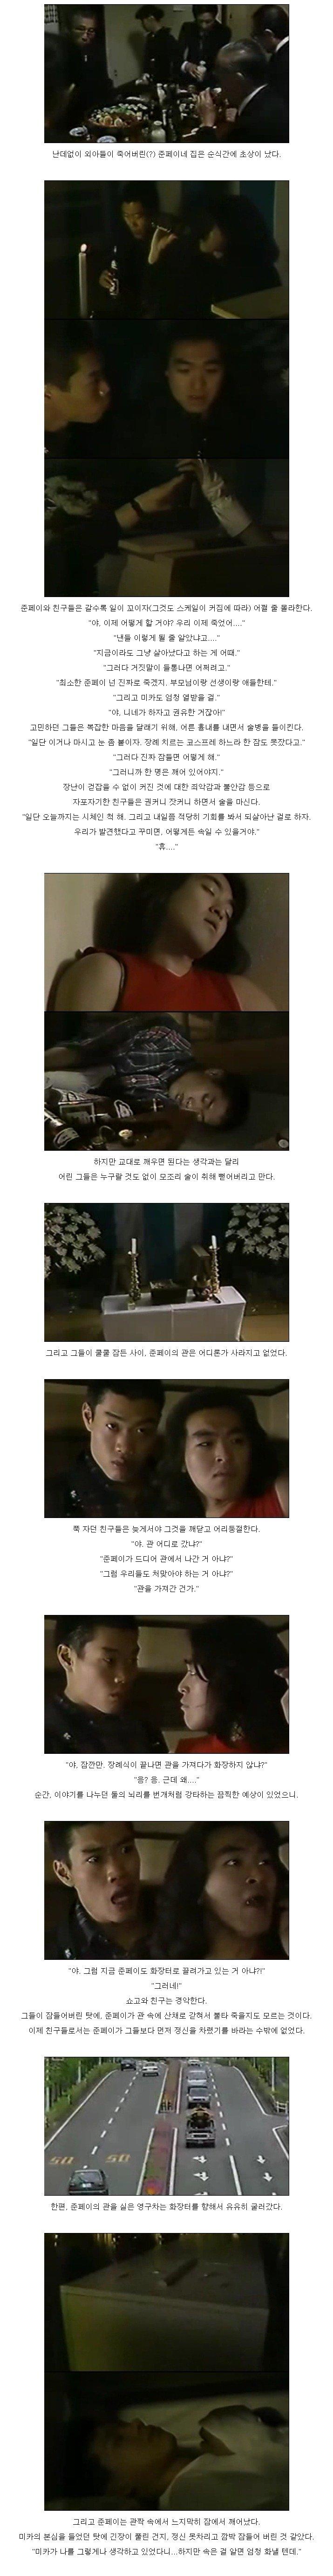 4.jpg 기묘한 이야기 - 장례식